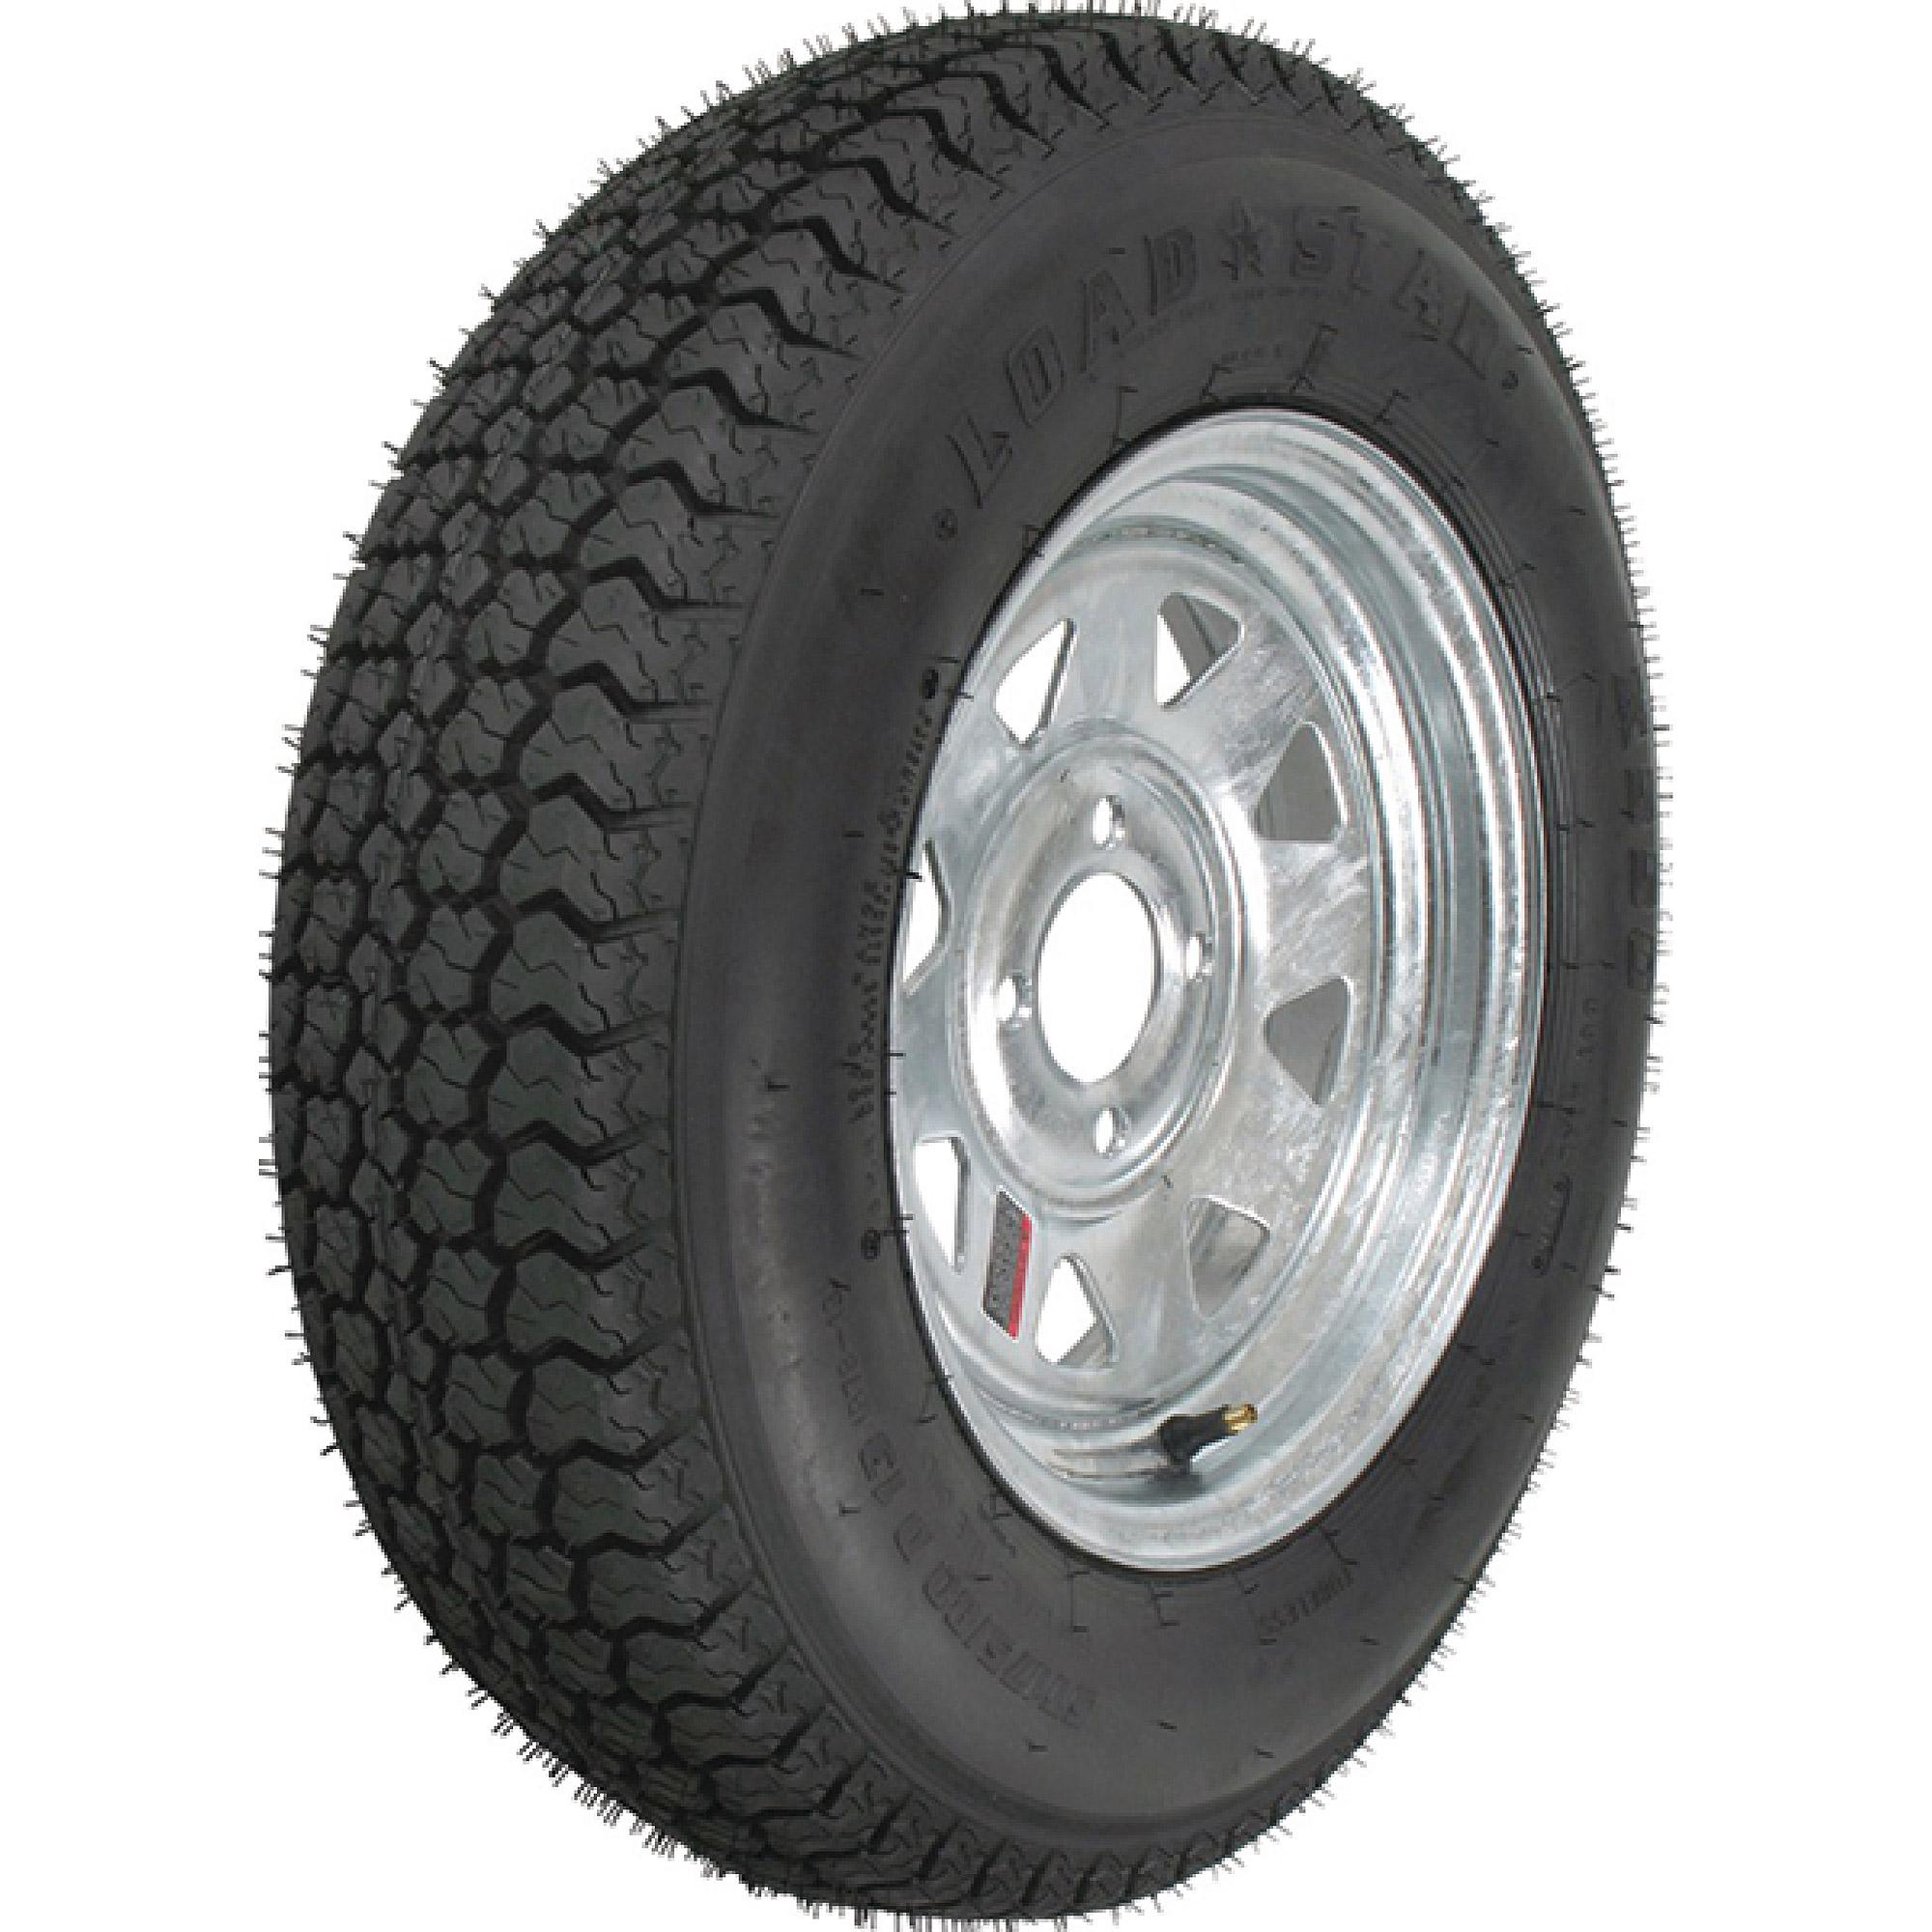 "2-Pk Trailer Tire & Rim ST175/80D13 13"" Load C 4 Lug Galv..."